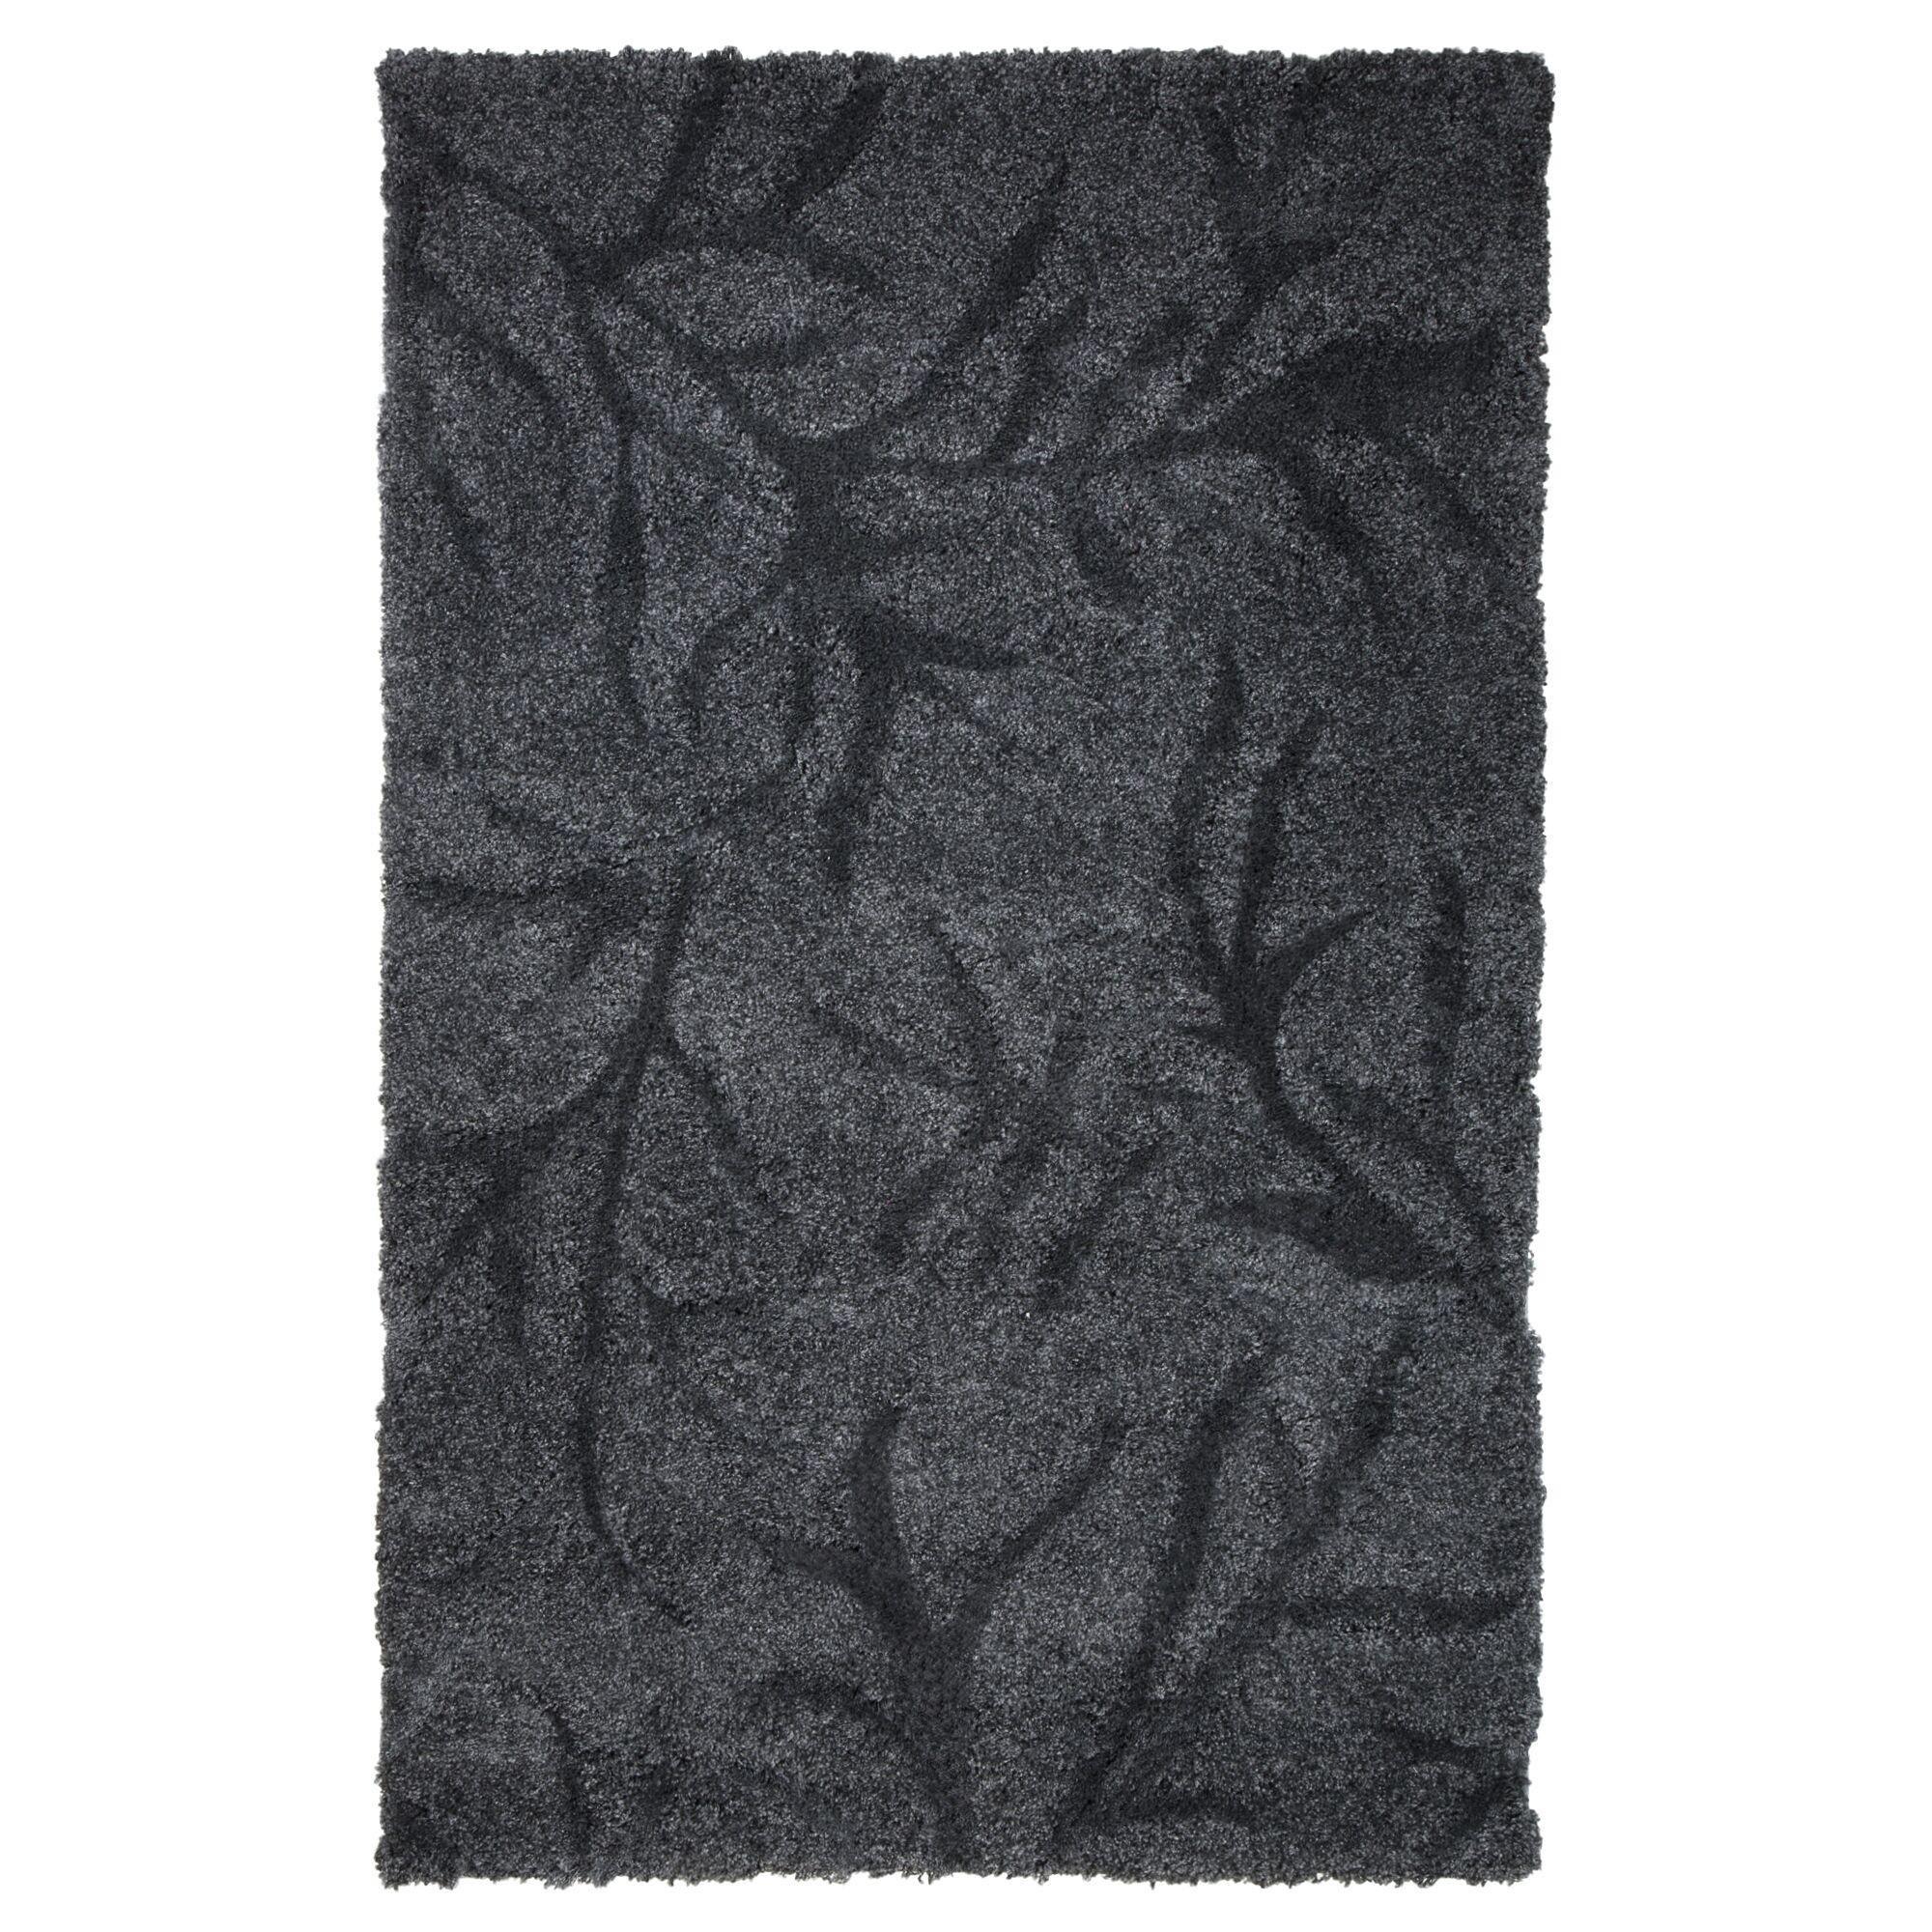 Northumberland Hand Woven Dark Grey Area Rug Rug Size: 5' x 7'7